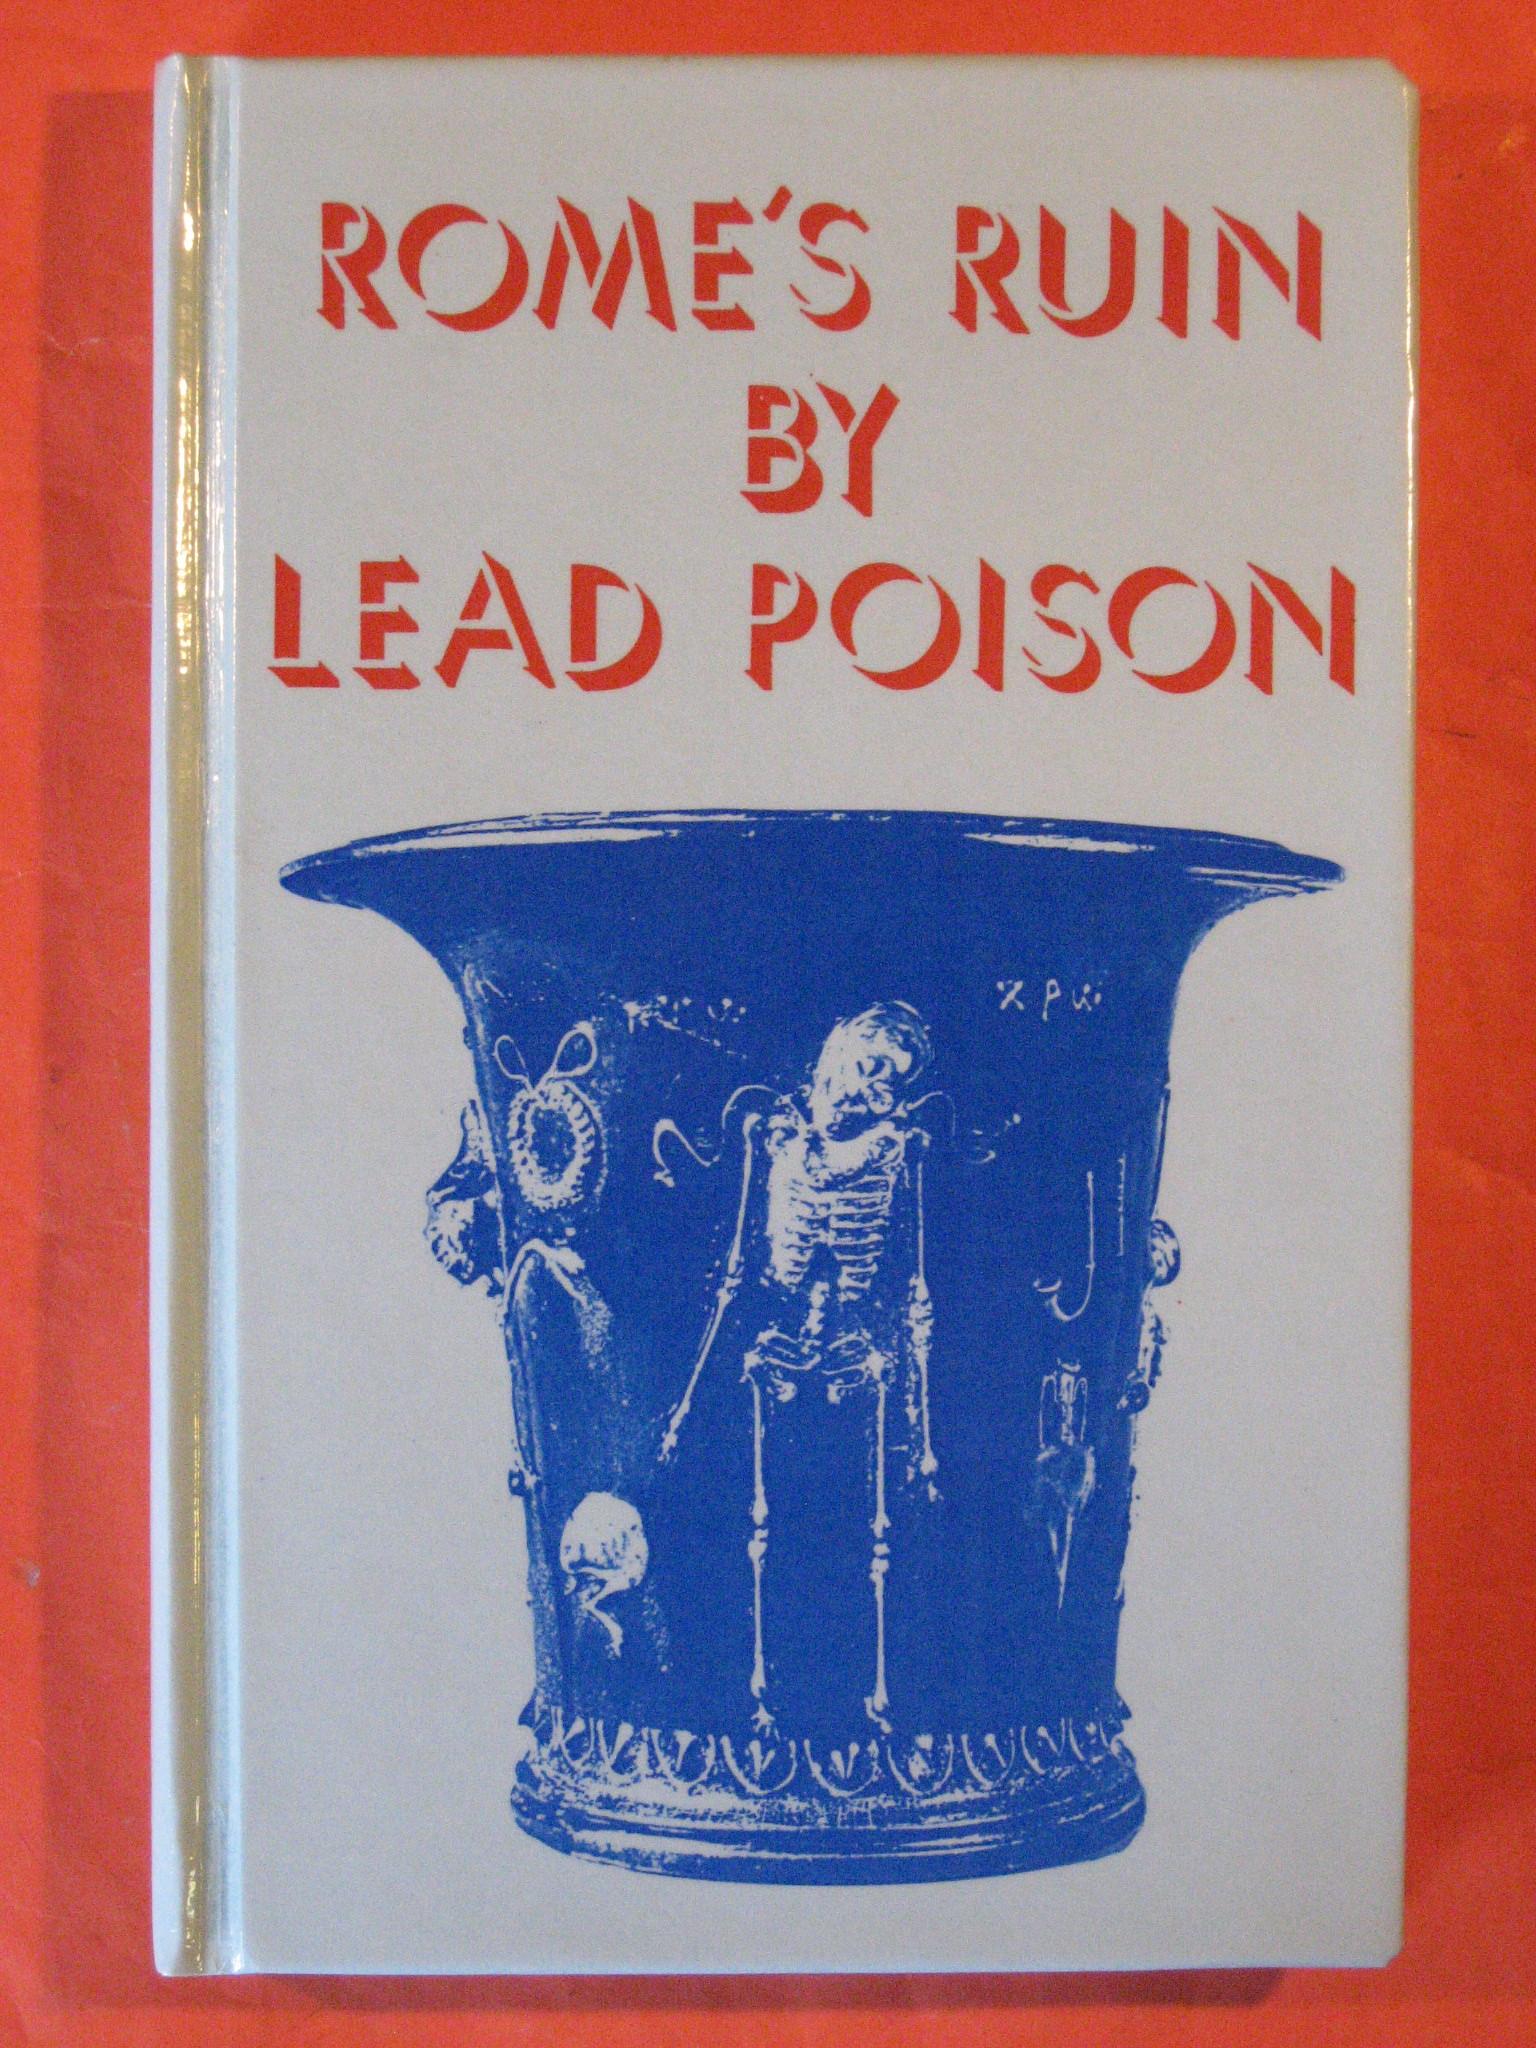 Rome's Ruin by Lead Poison, Gilfillan, S. Colum